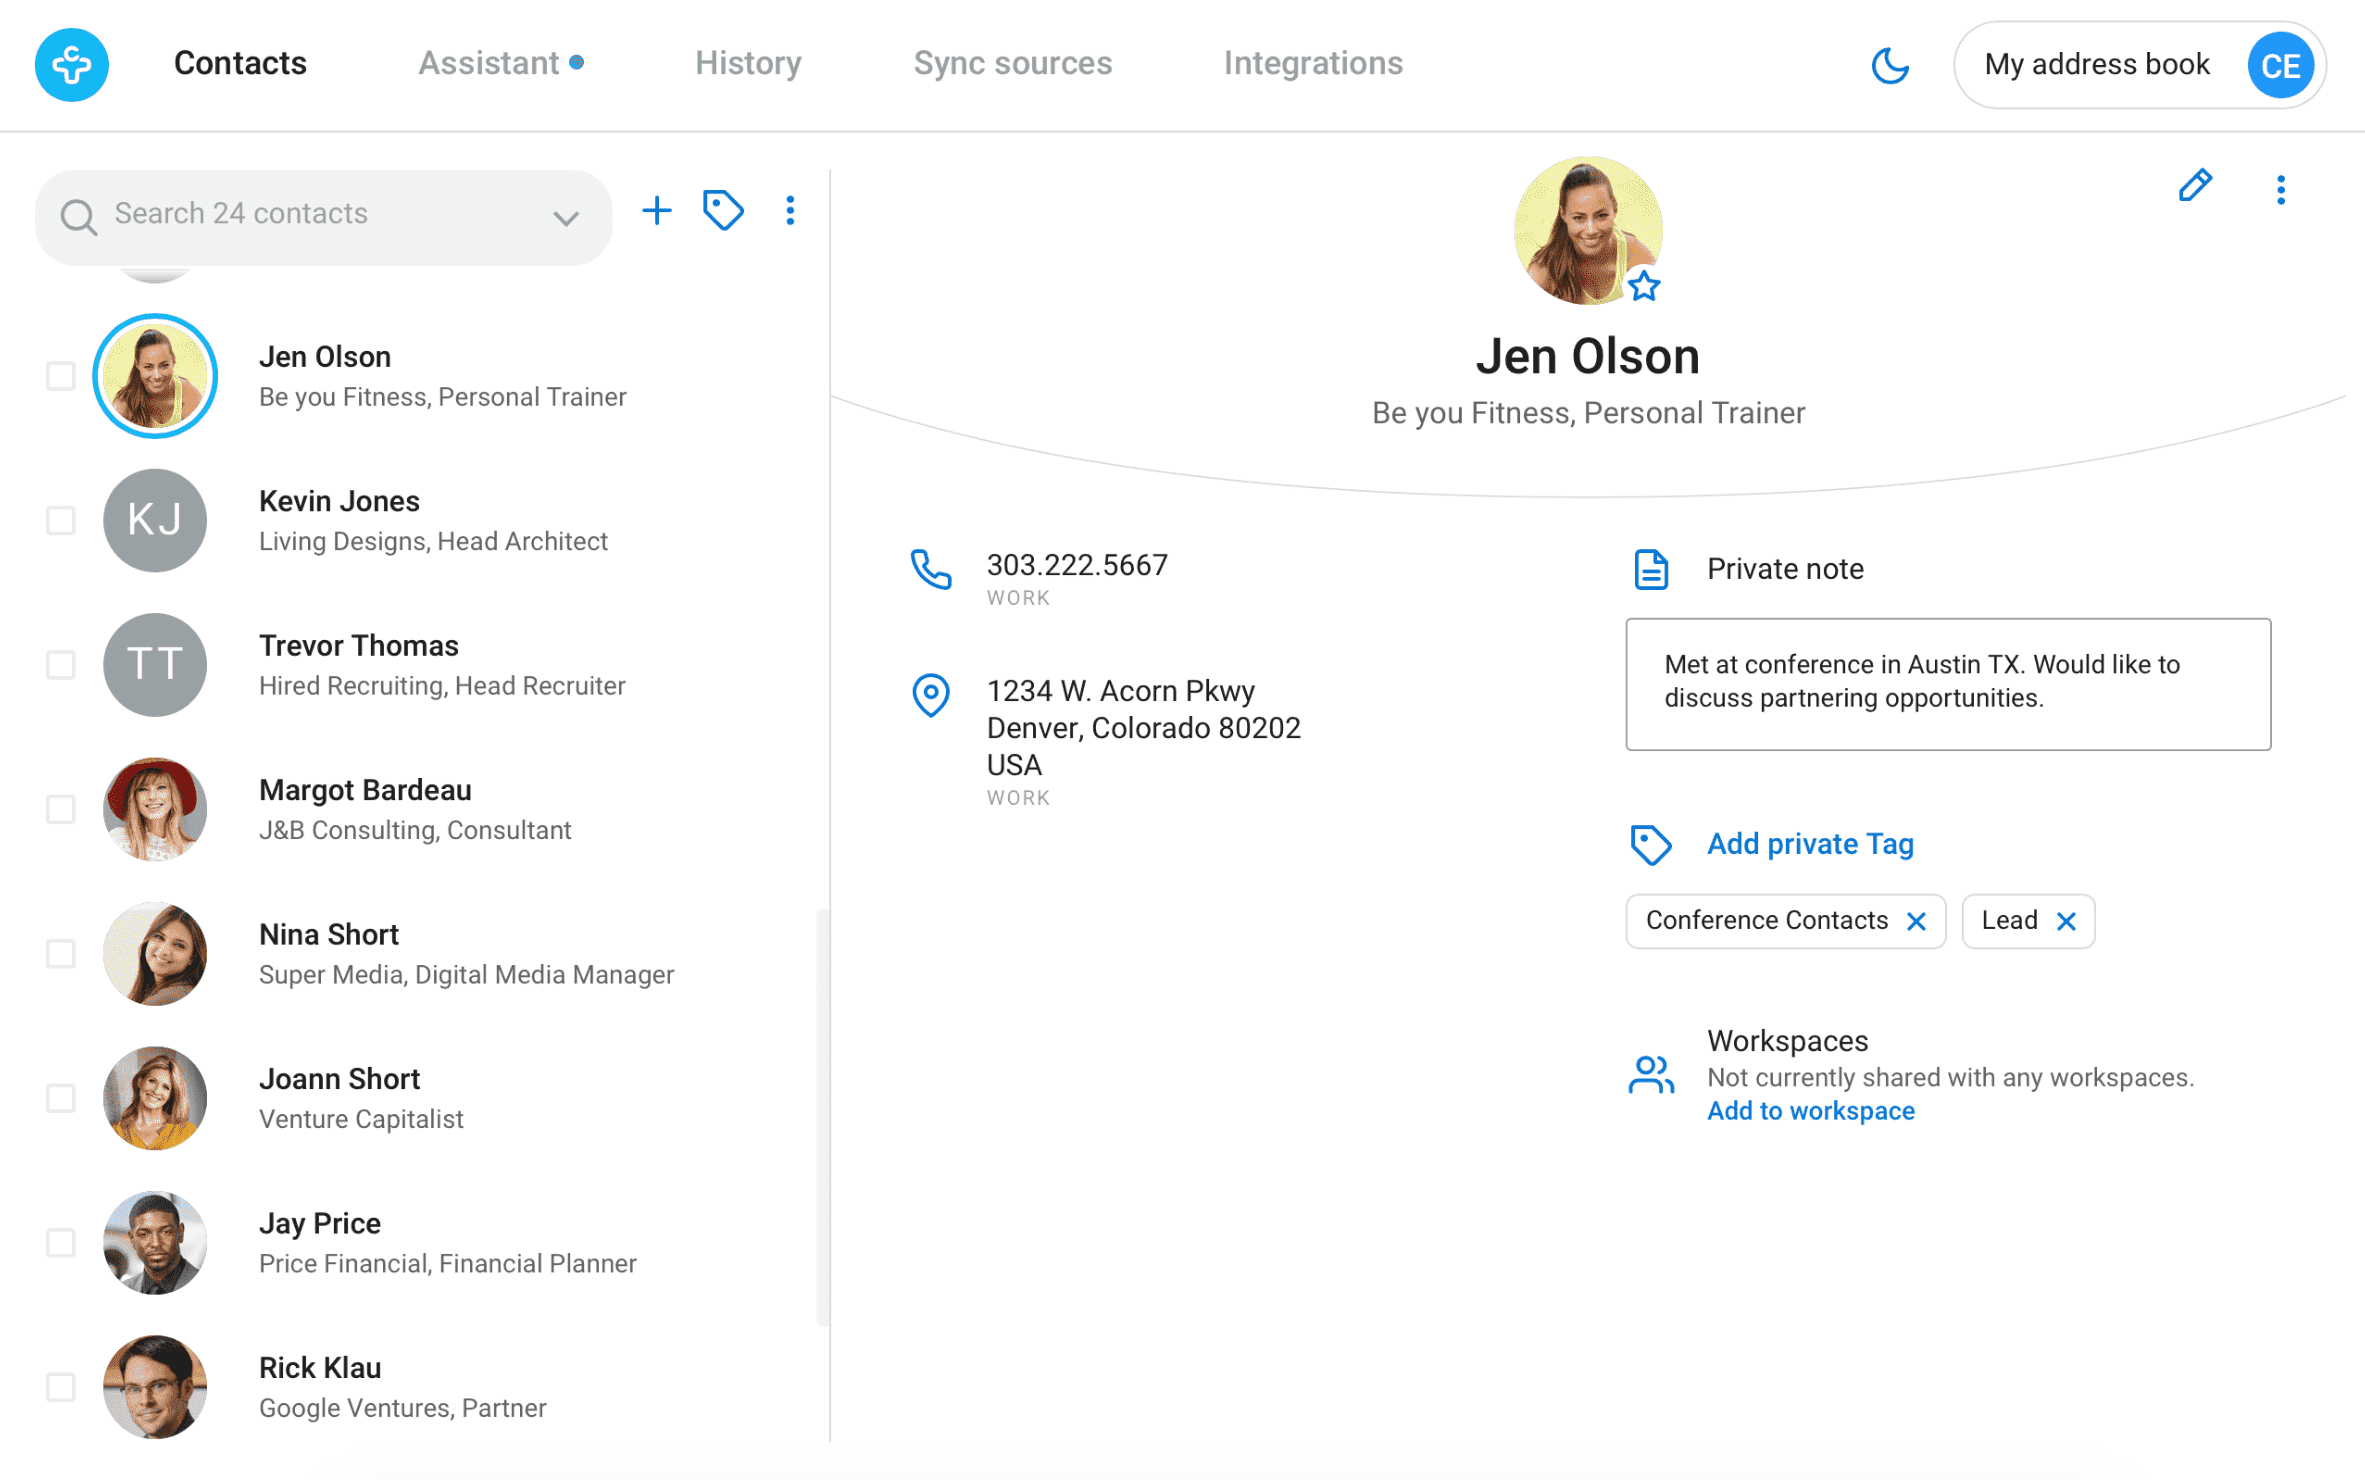 web-contact-card-9-17-2019